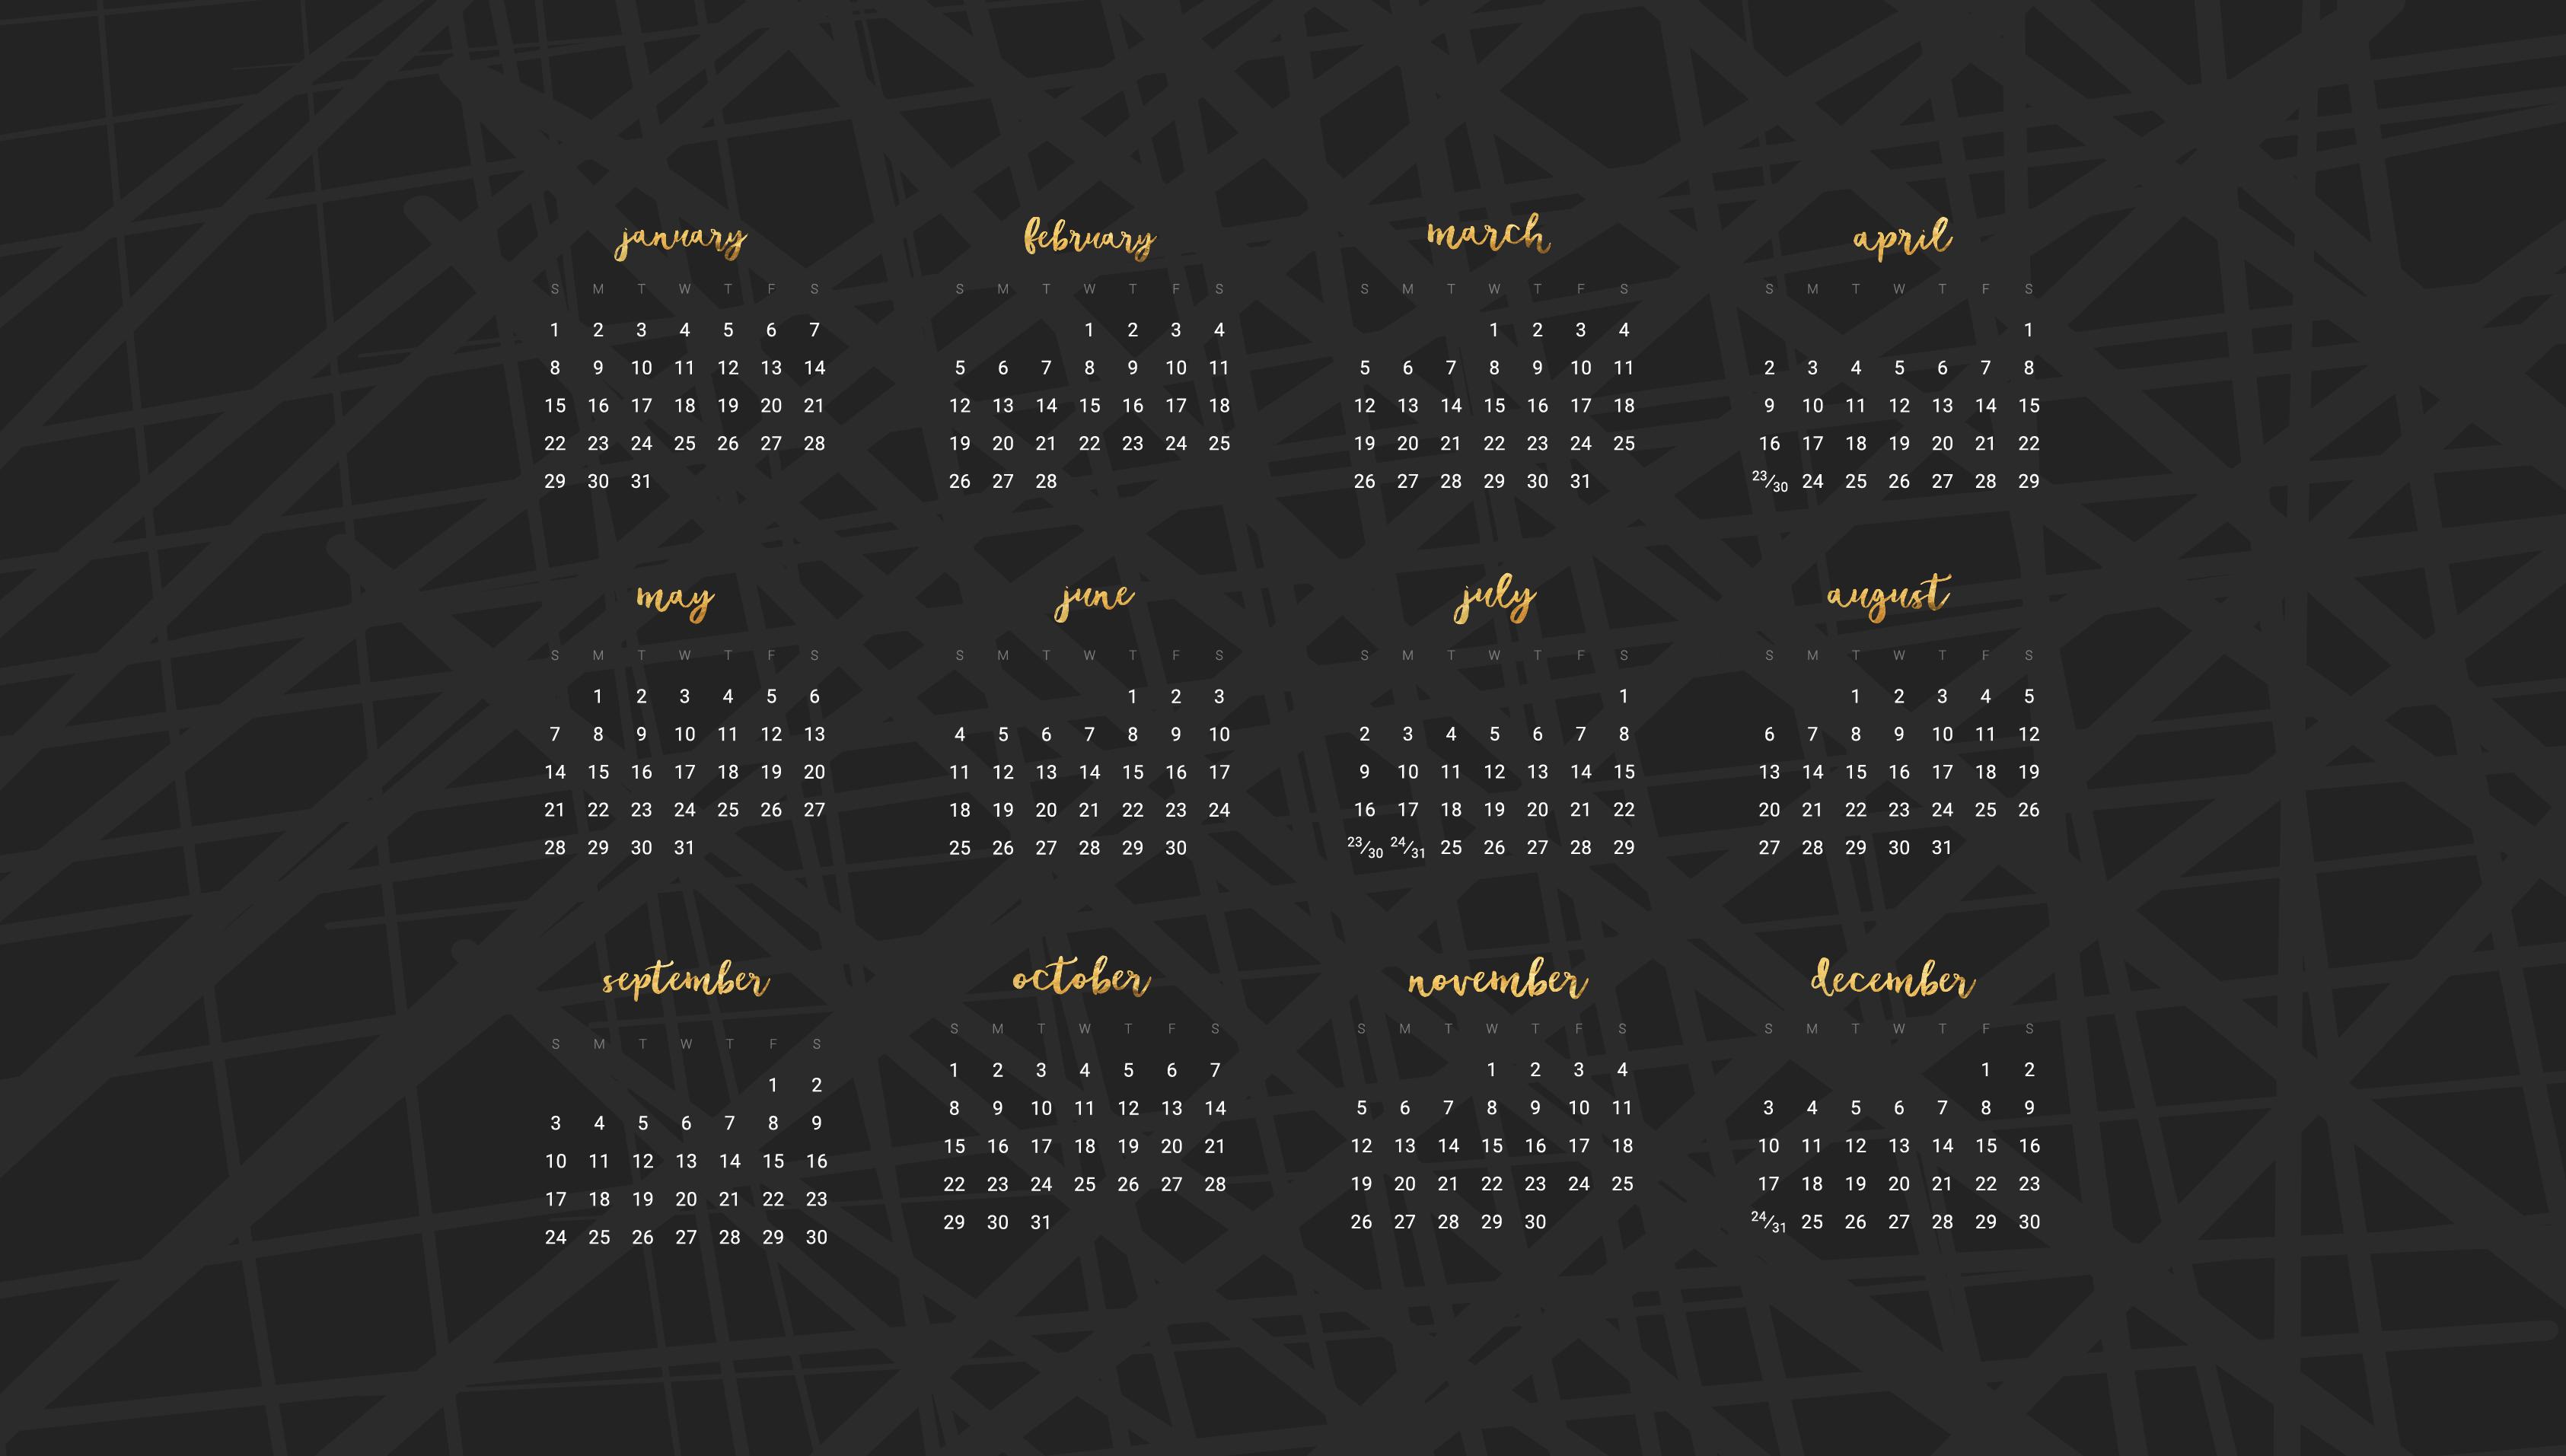 Free 2017 Desktop Wallpaper Calendars Desktop Wallpaper Calendar Desktop Wallpaper Wallpaper